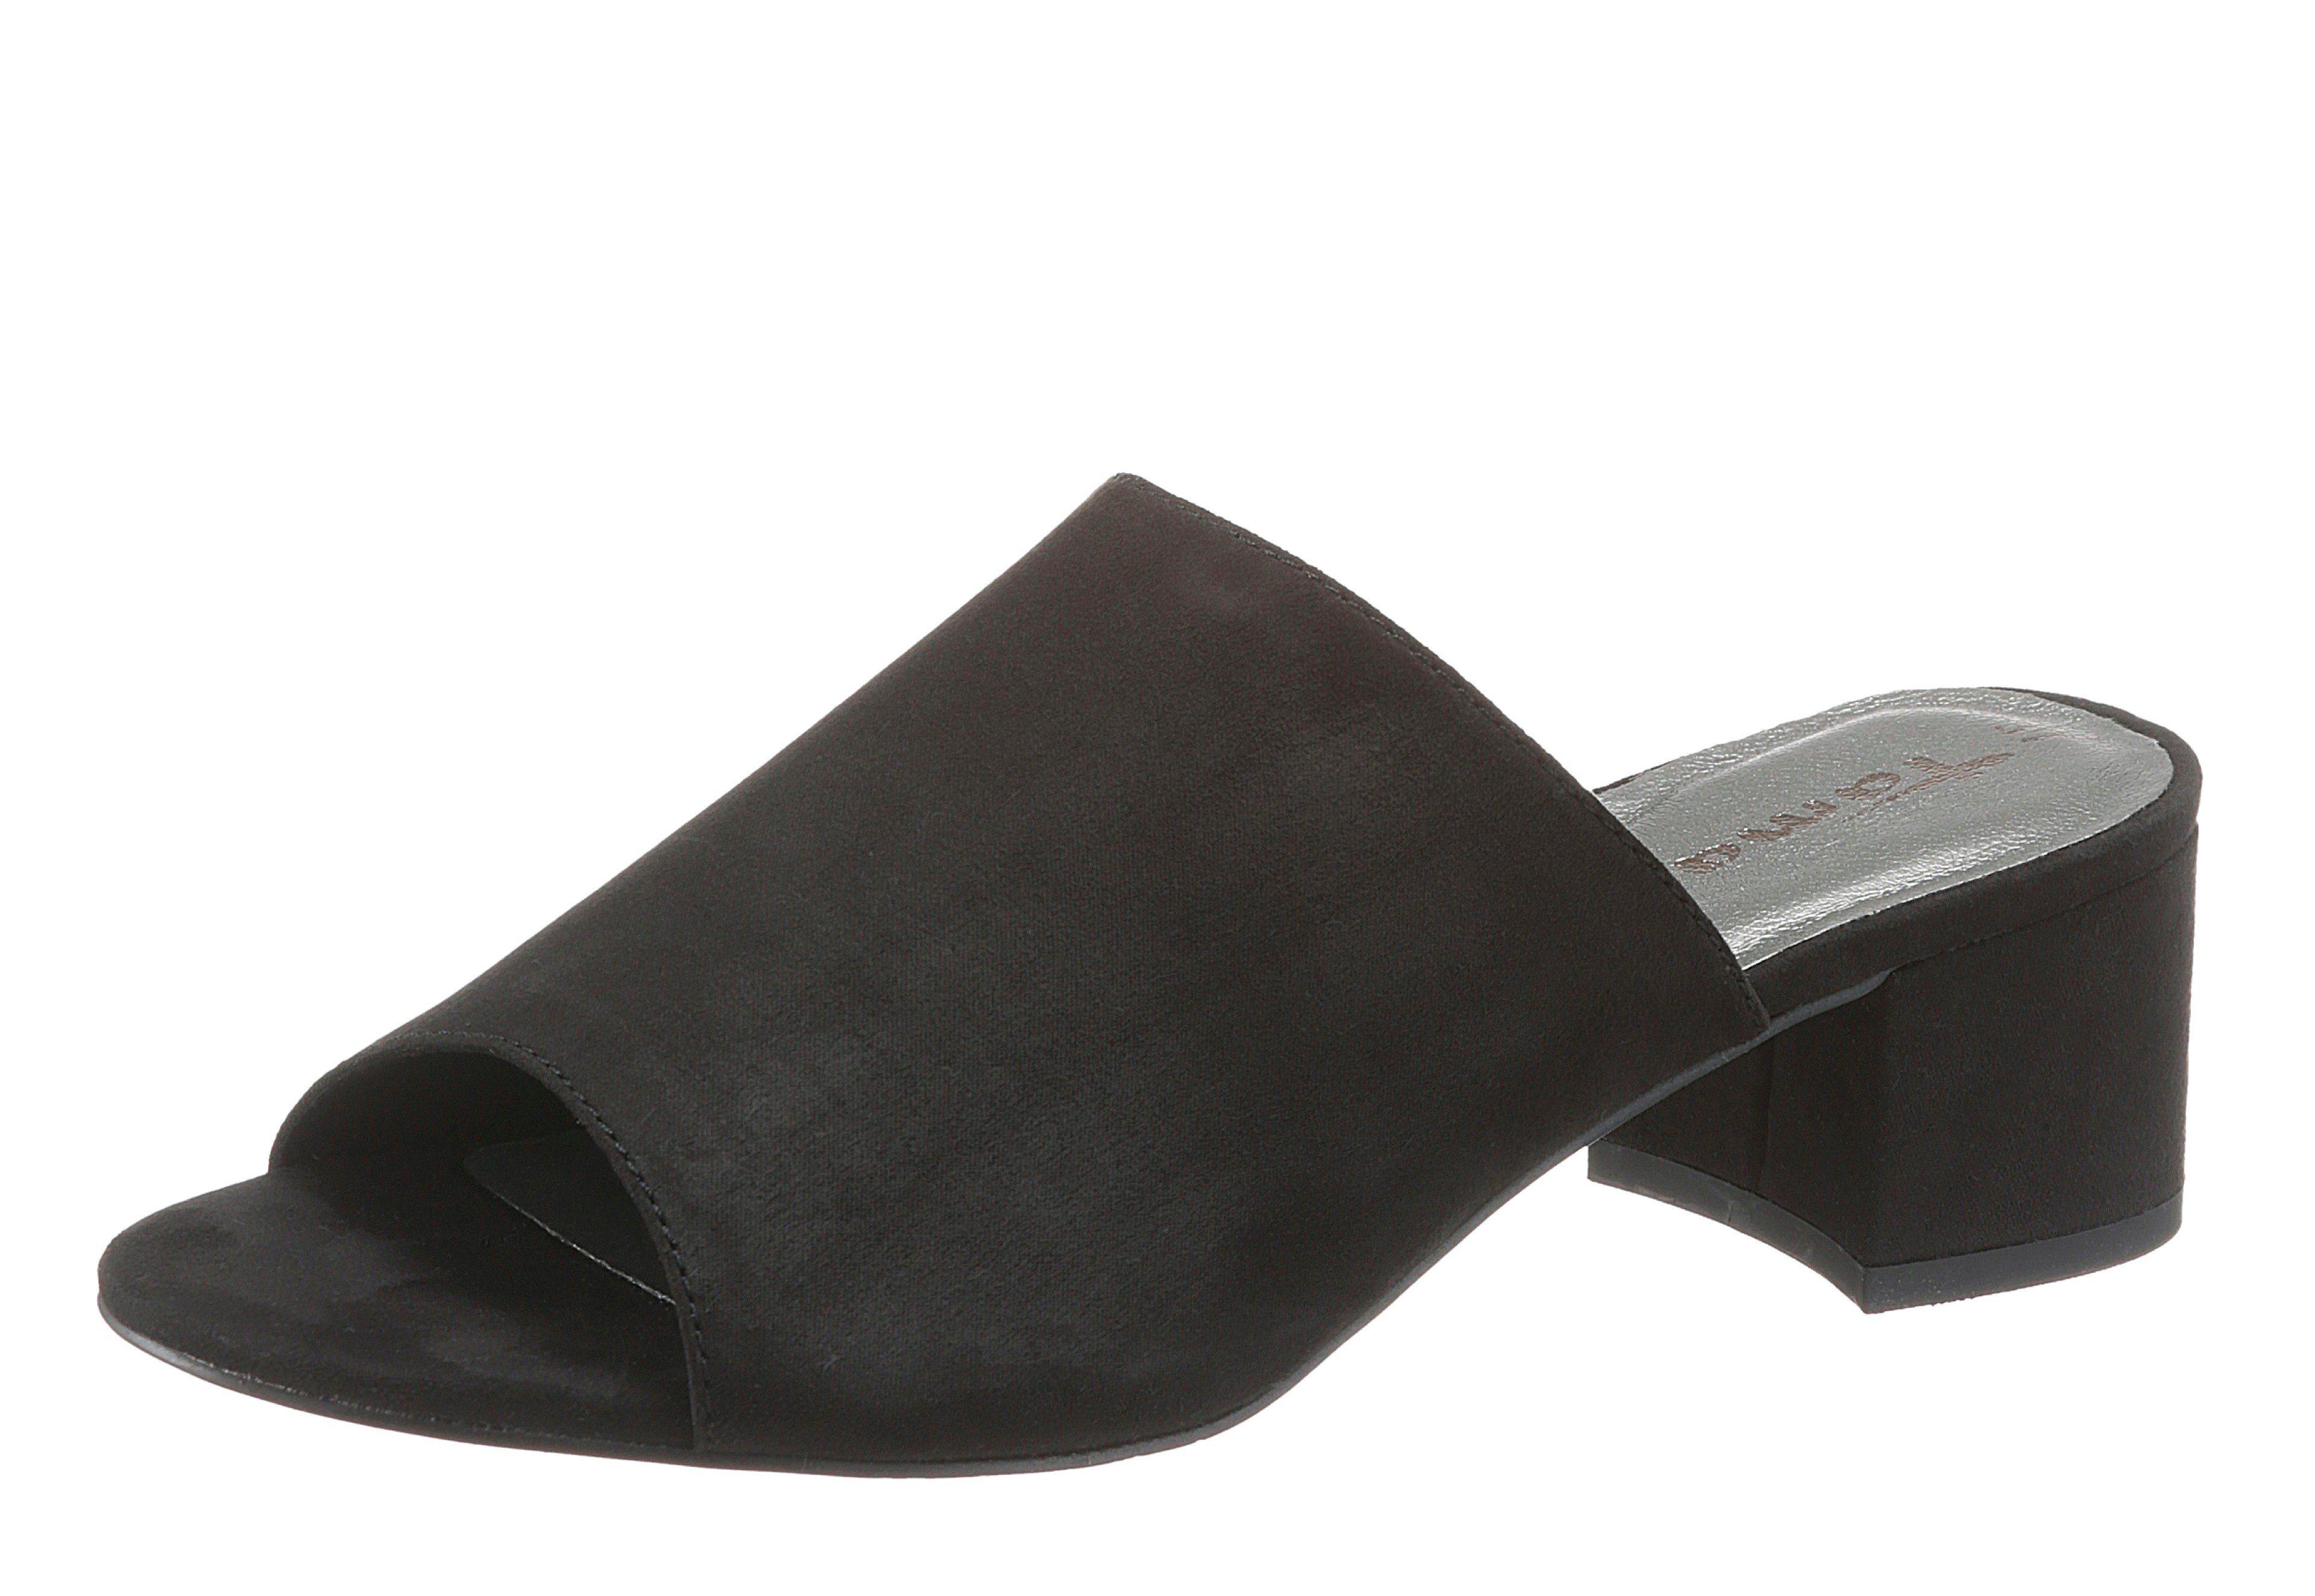 Tamaris Pantolette, mit markantem Blockabsatz  schwarz